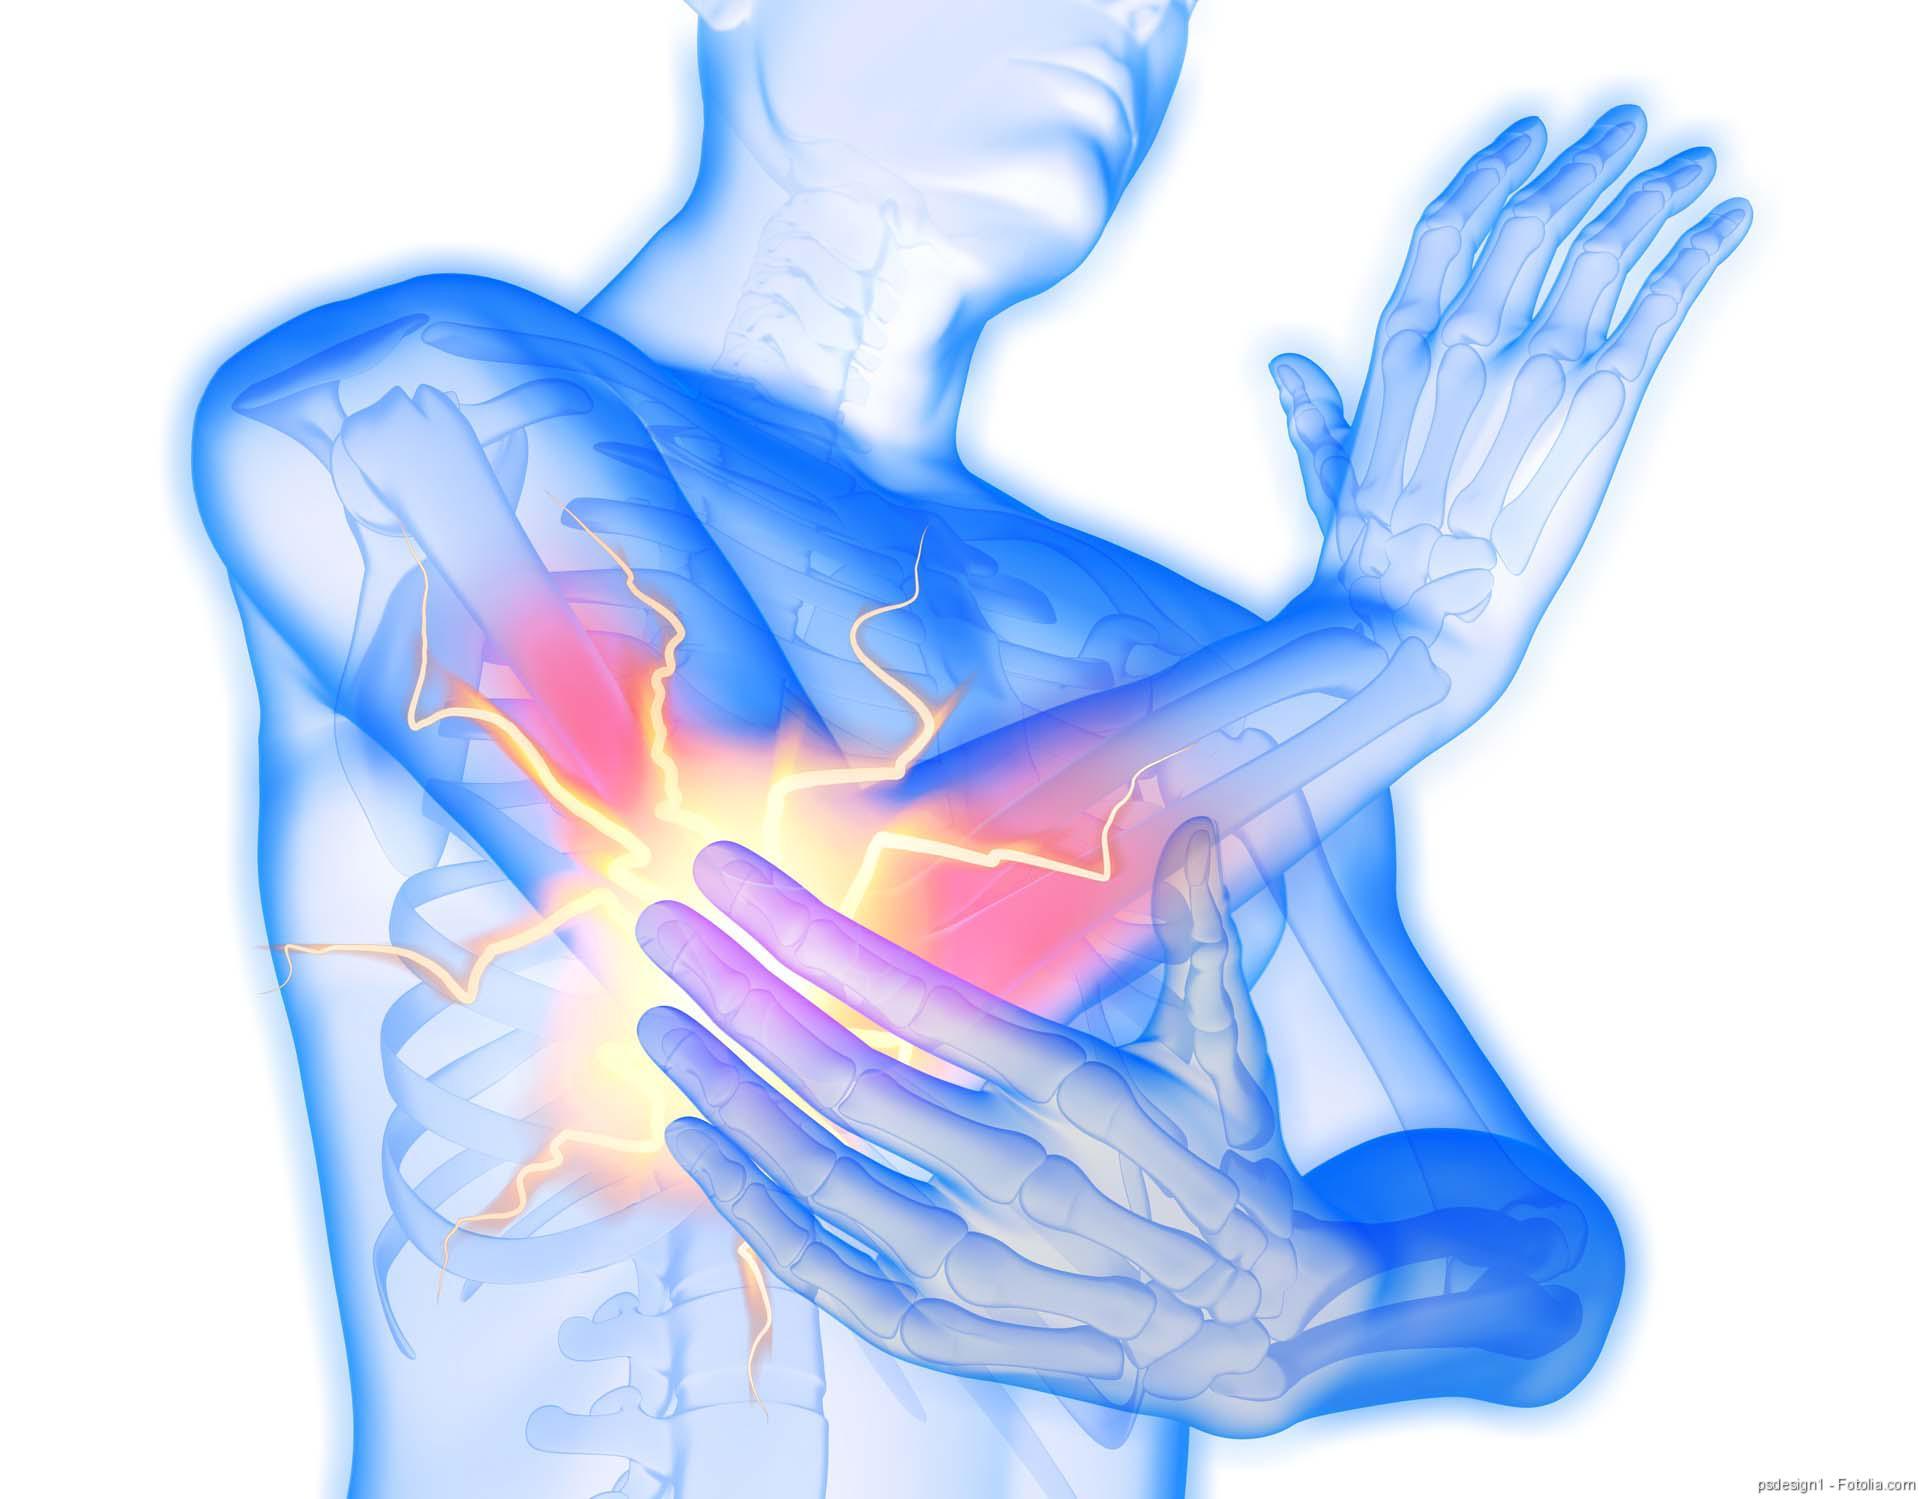 Schmerz, Rheuma, Rheumatoide Arthritis, Rheumaerkrankungen